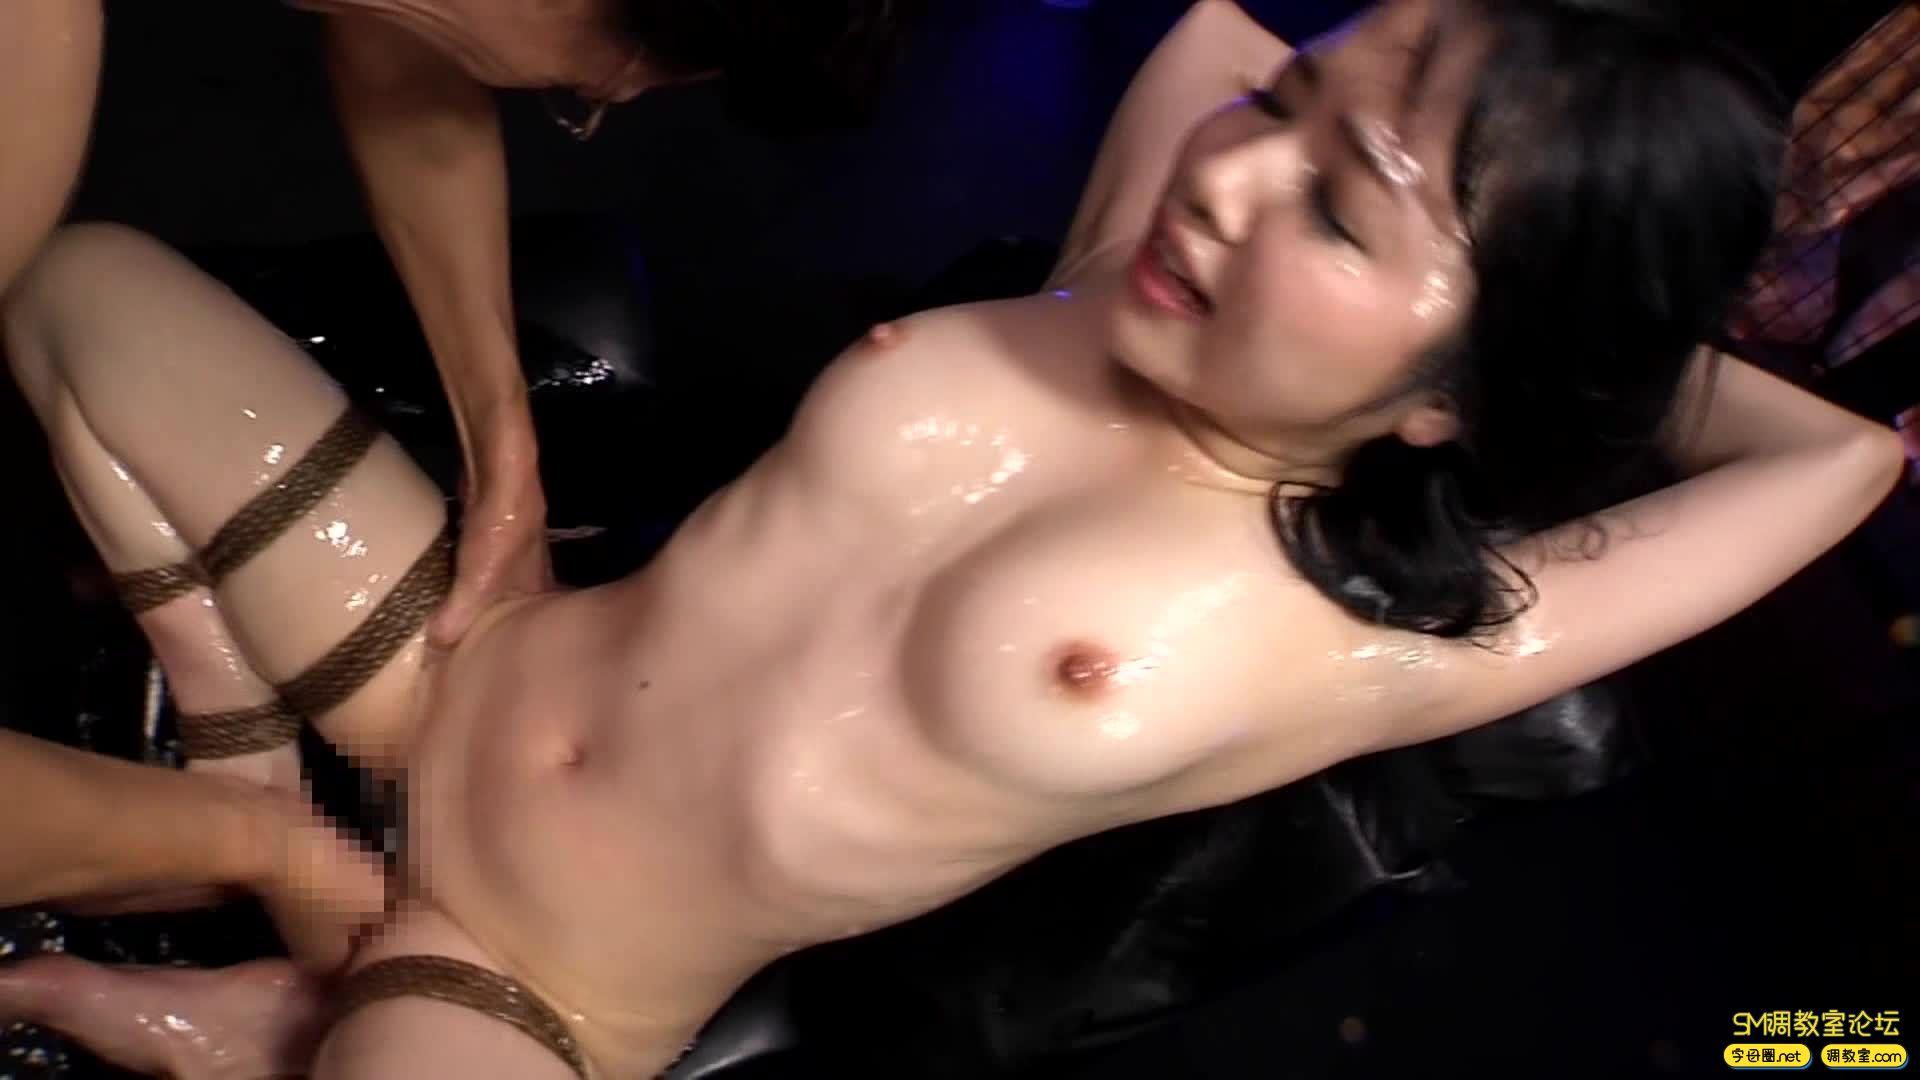 [Dogma合集] - DDT-449 - 拘束椅子トランス みなみ愛梨-视频截图5